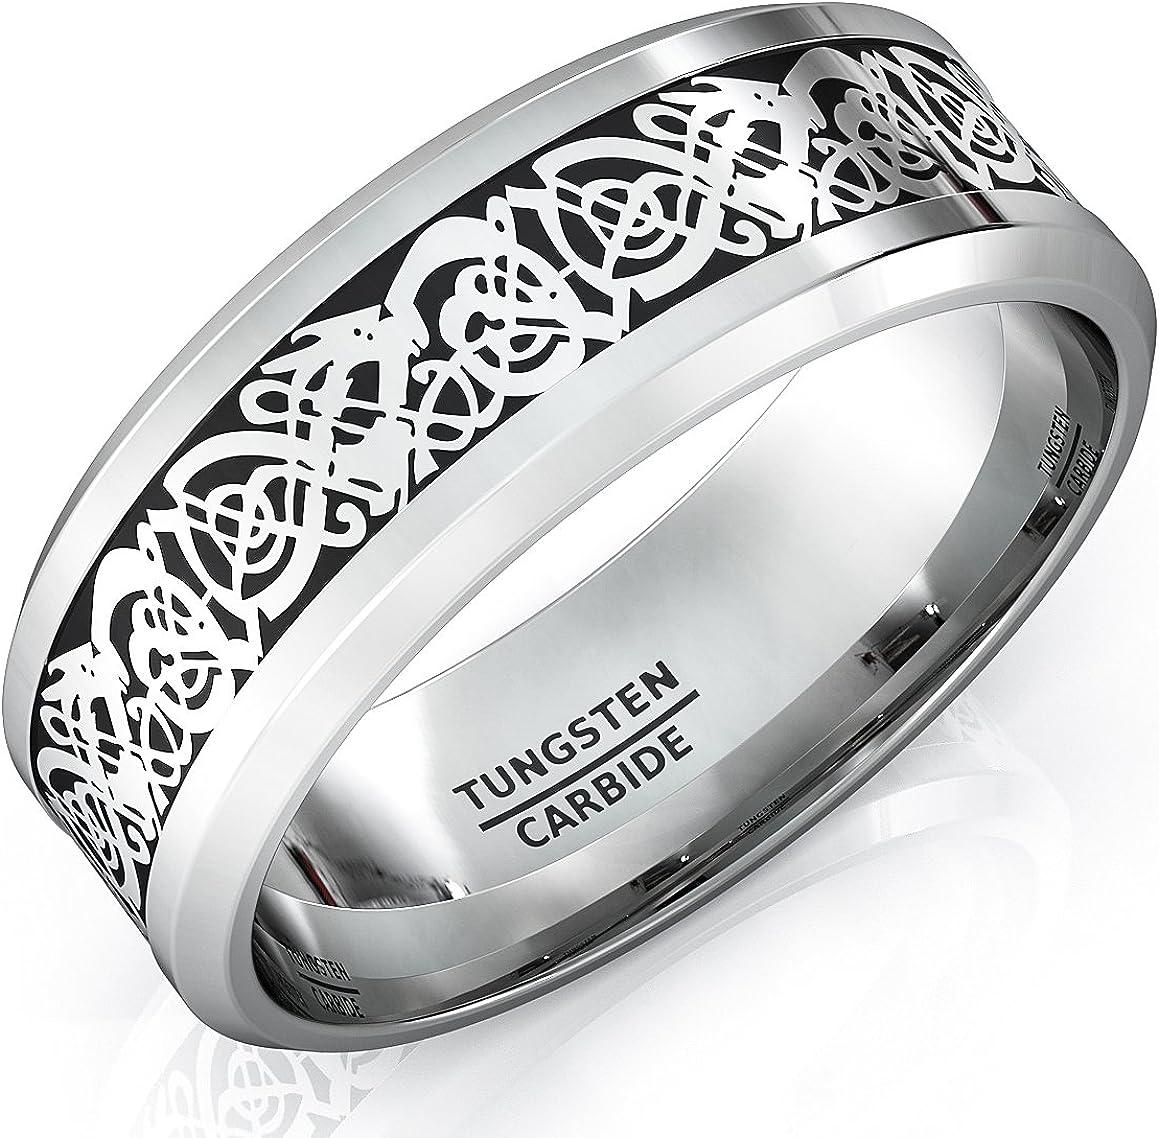 Duke Collections Mens Wedding Bands Tungsten Ring High Polished Celtic Dragon Design Beveled Edge 8mm Comfort Fit